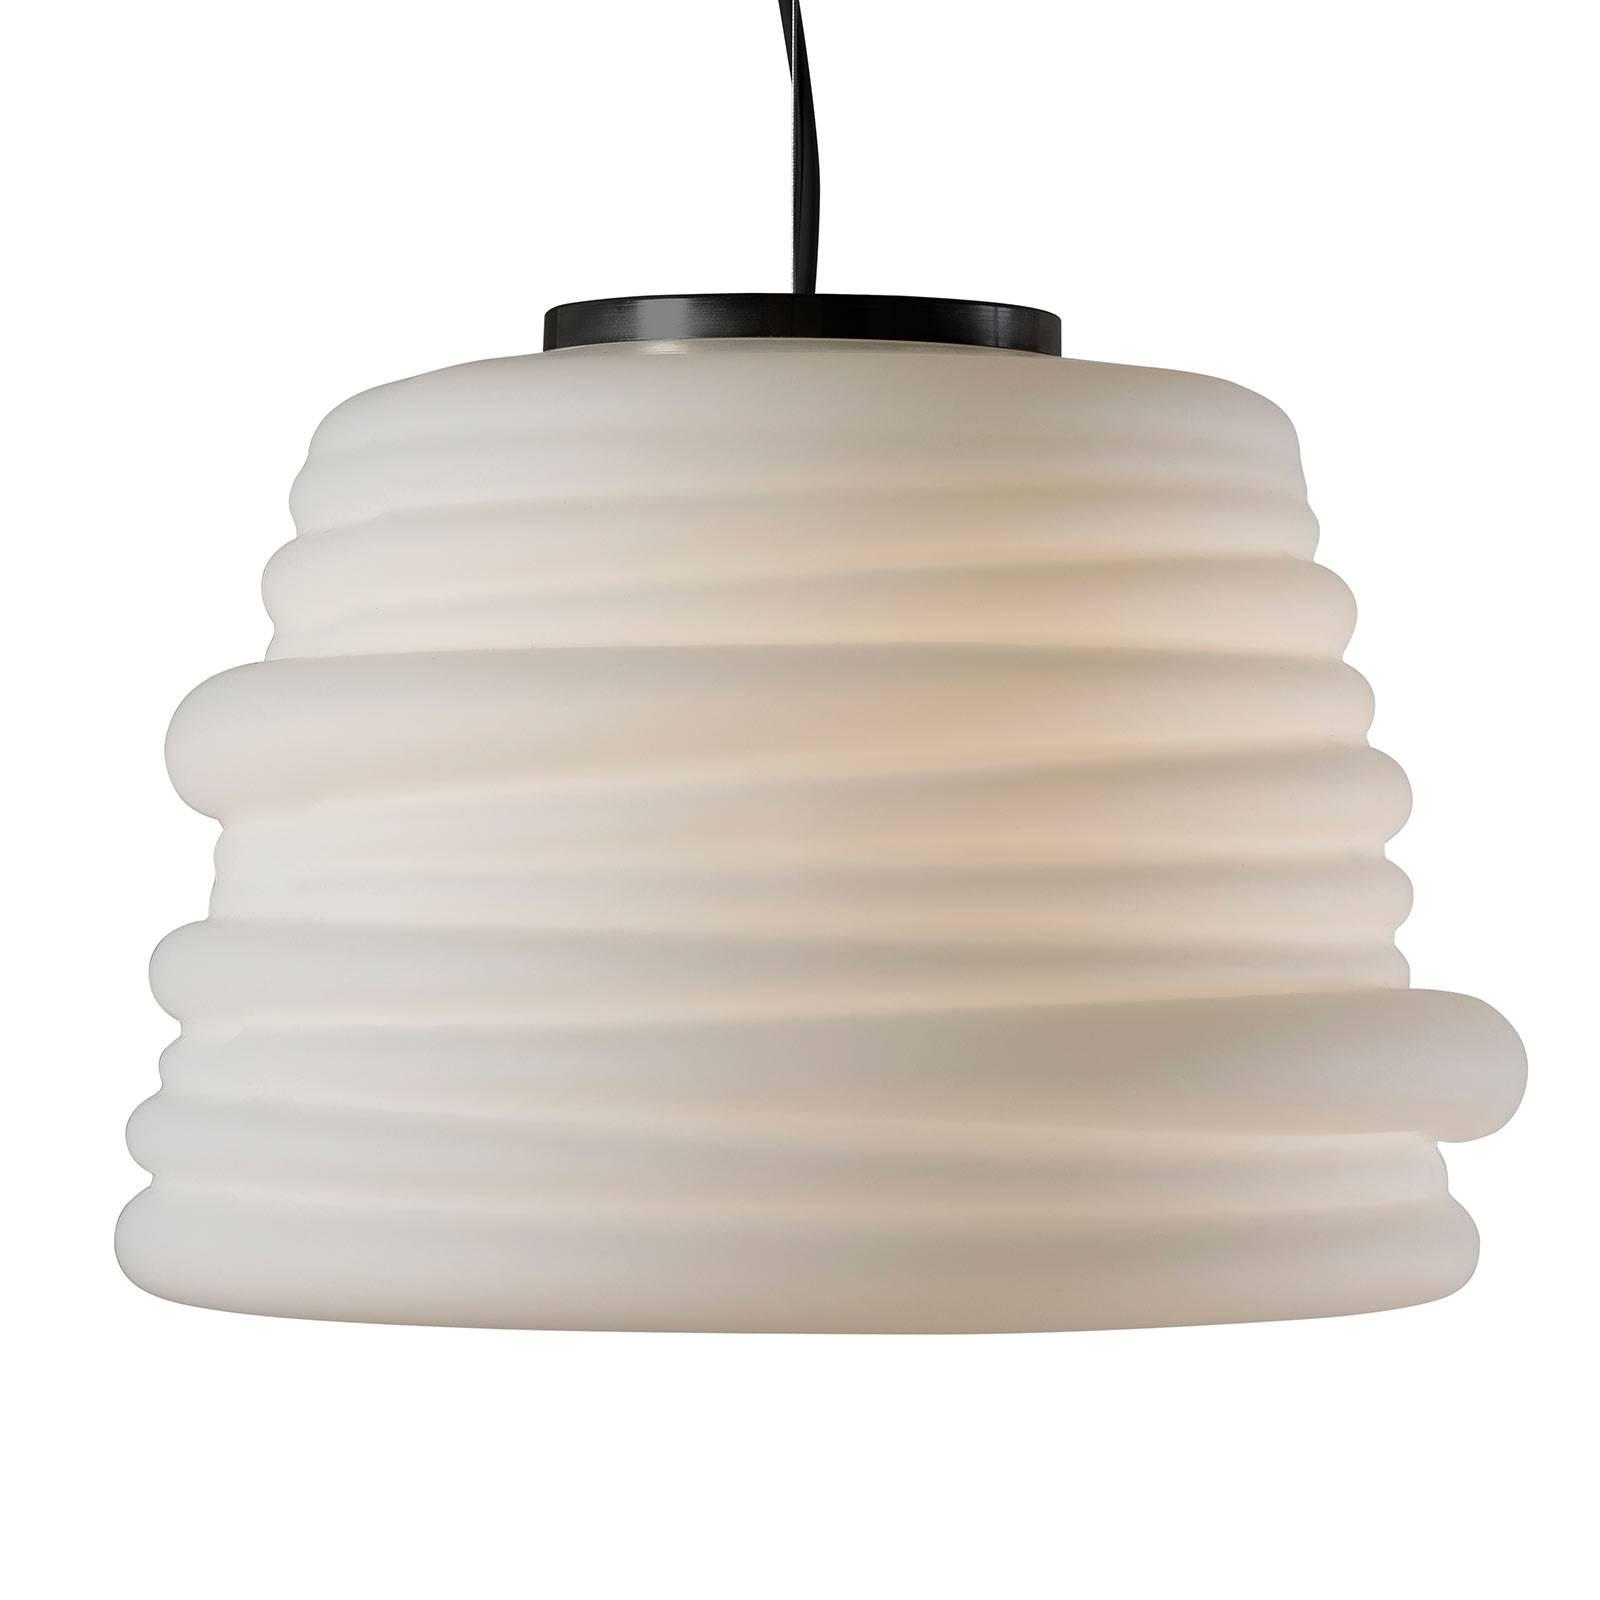 Karman Bibendum suspension LED, Ø 35cm, blanche